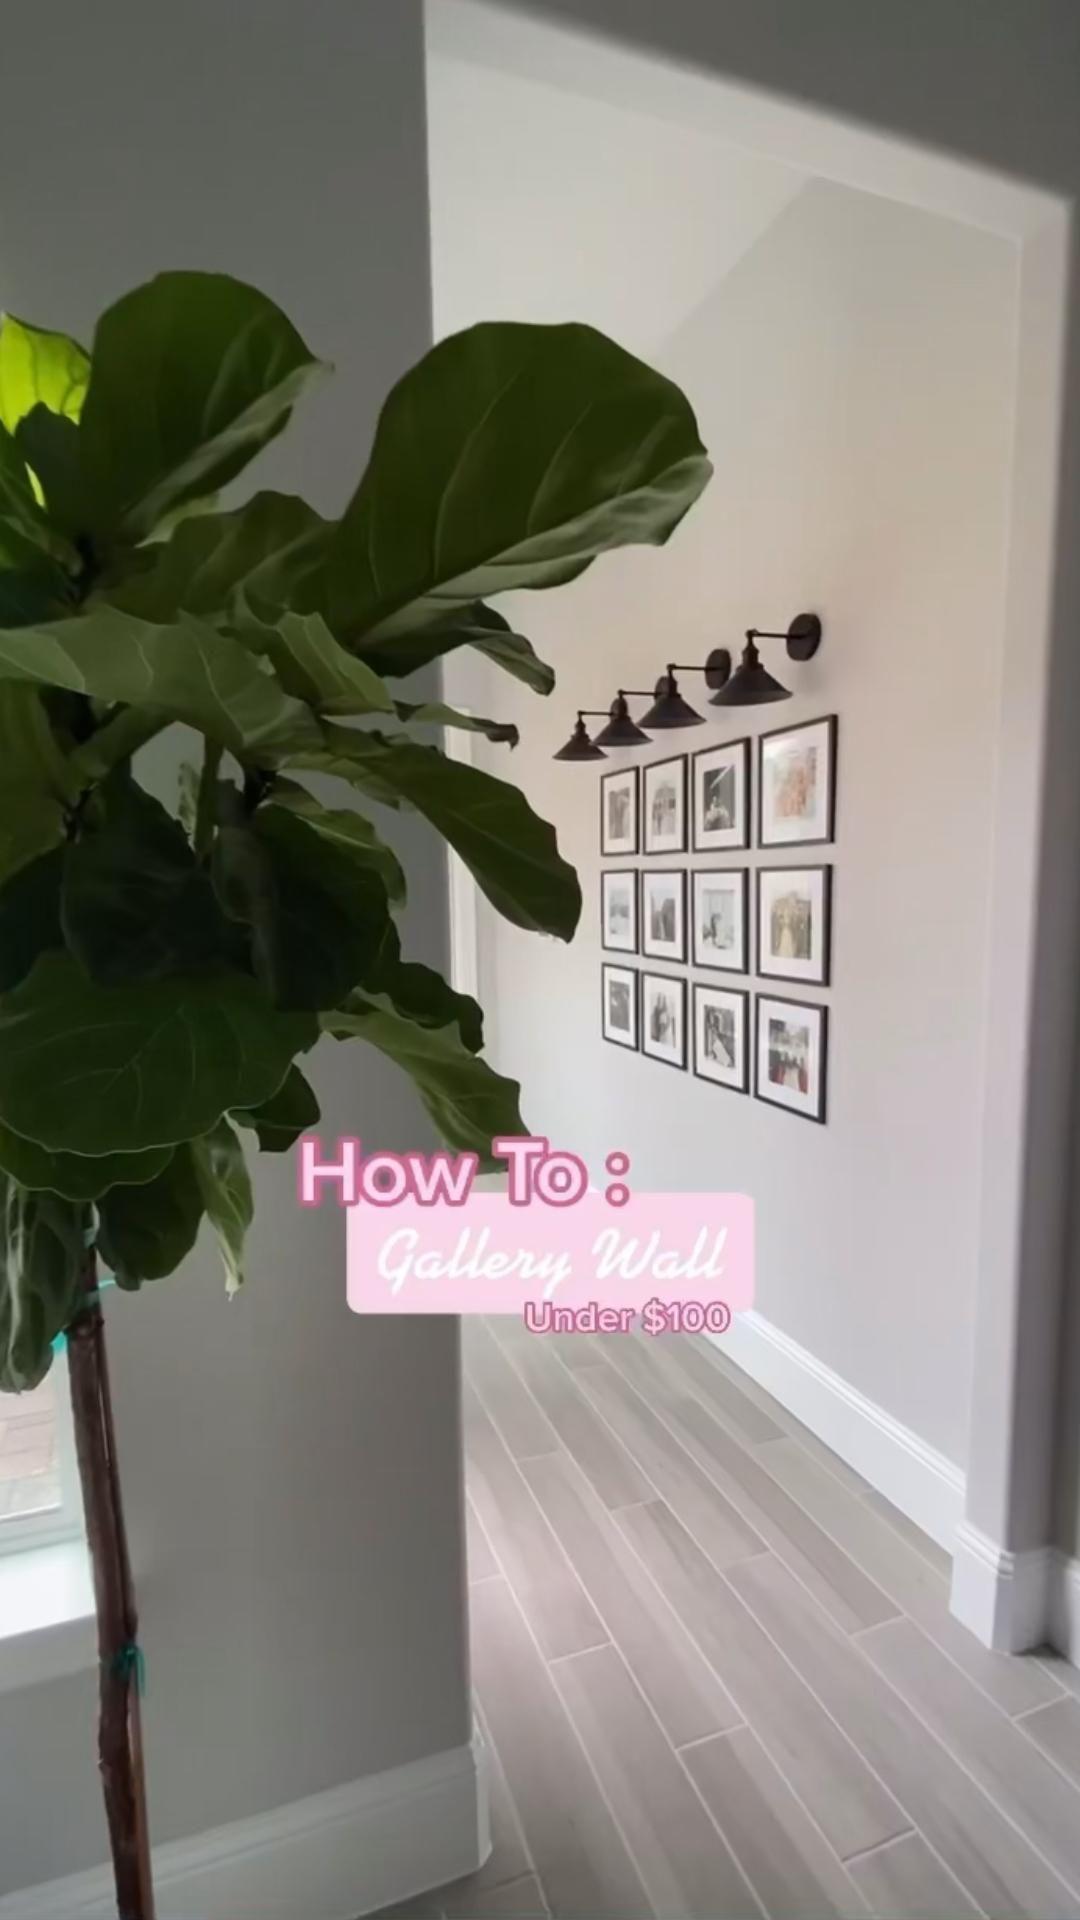 Puck light hack! For more home DIYs, follow @LovetheLunas on Instagram